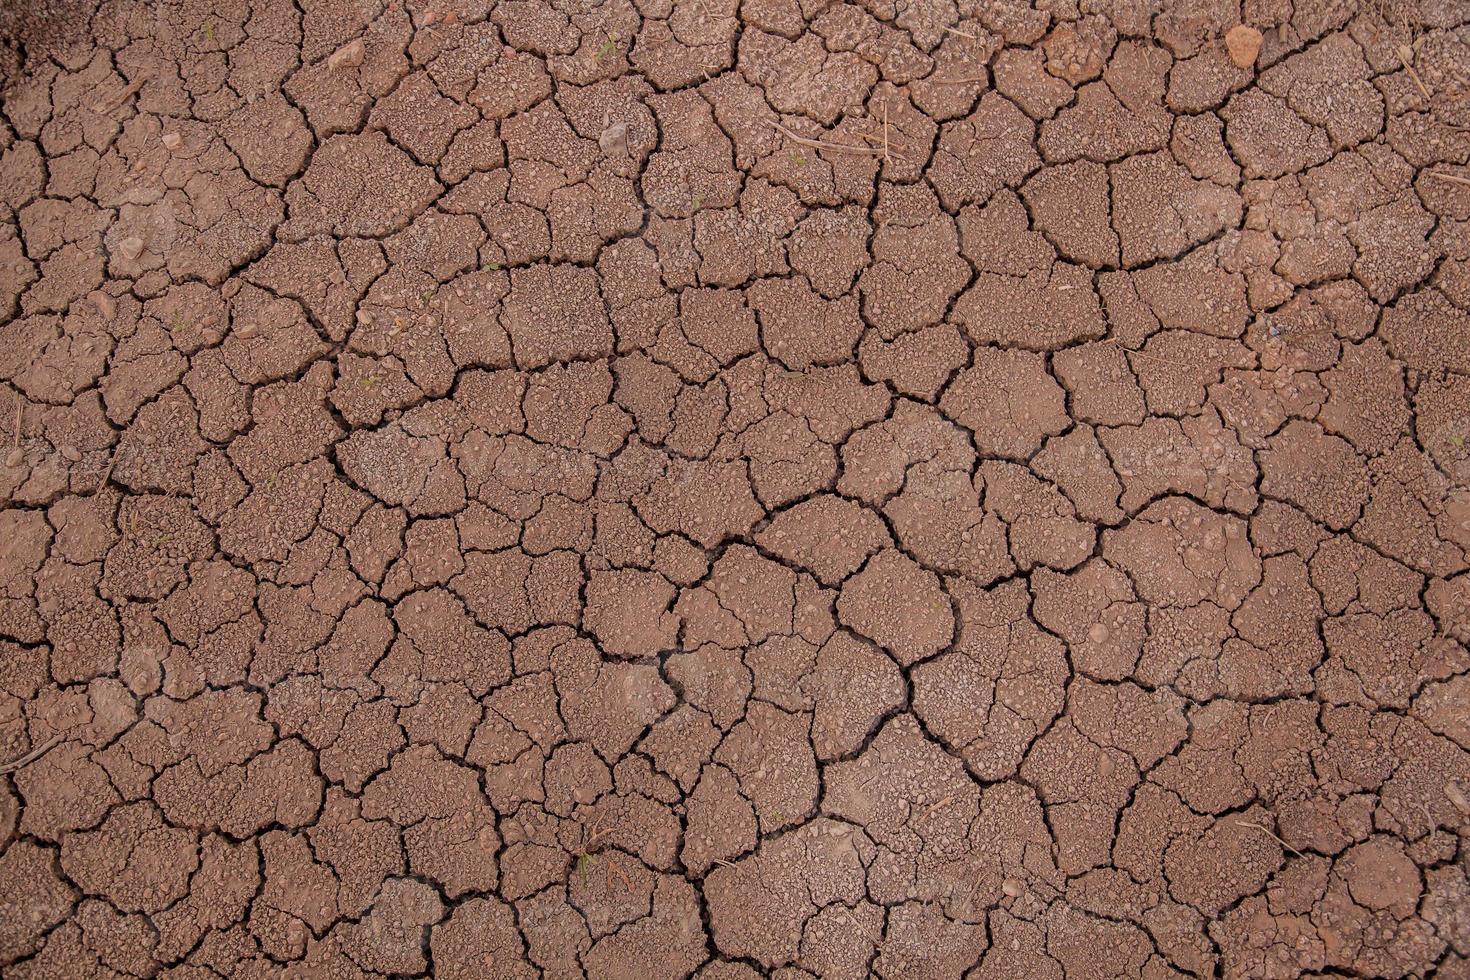 cracked earth photo